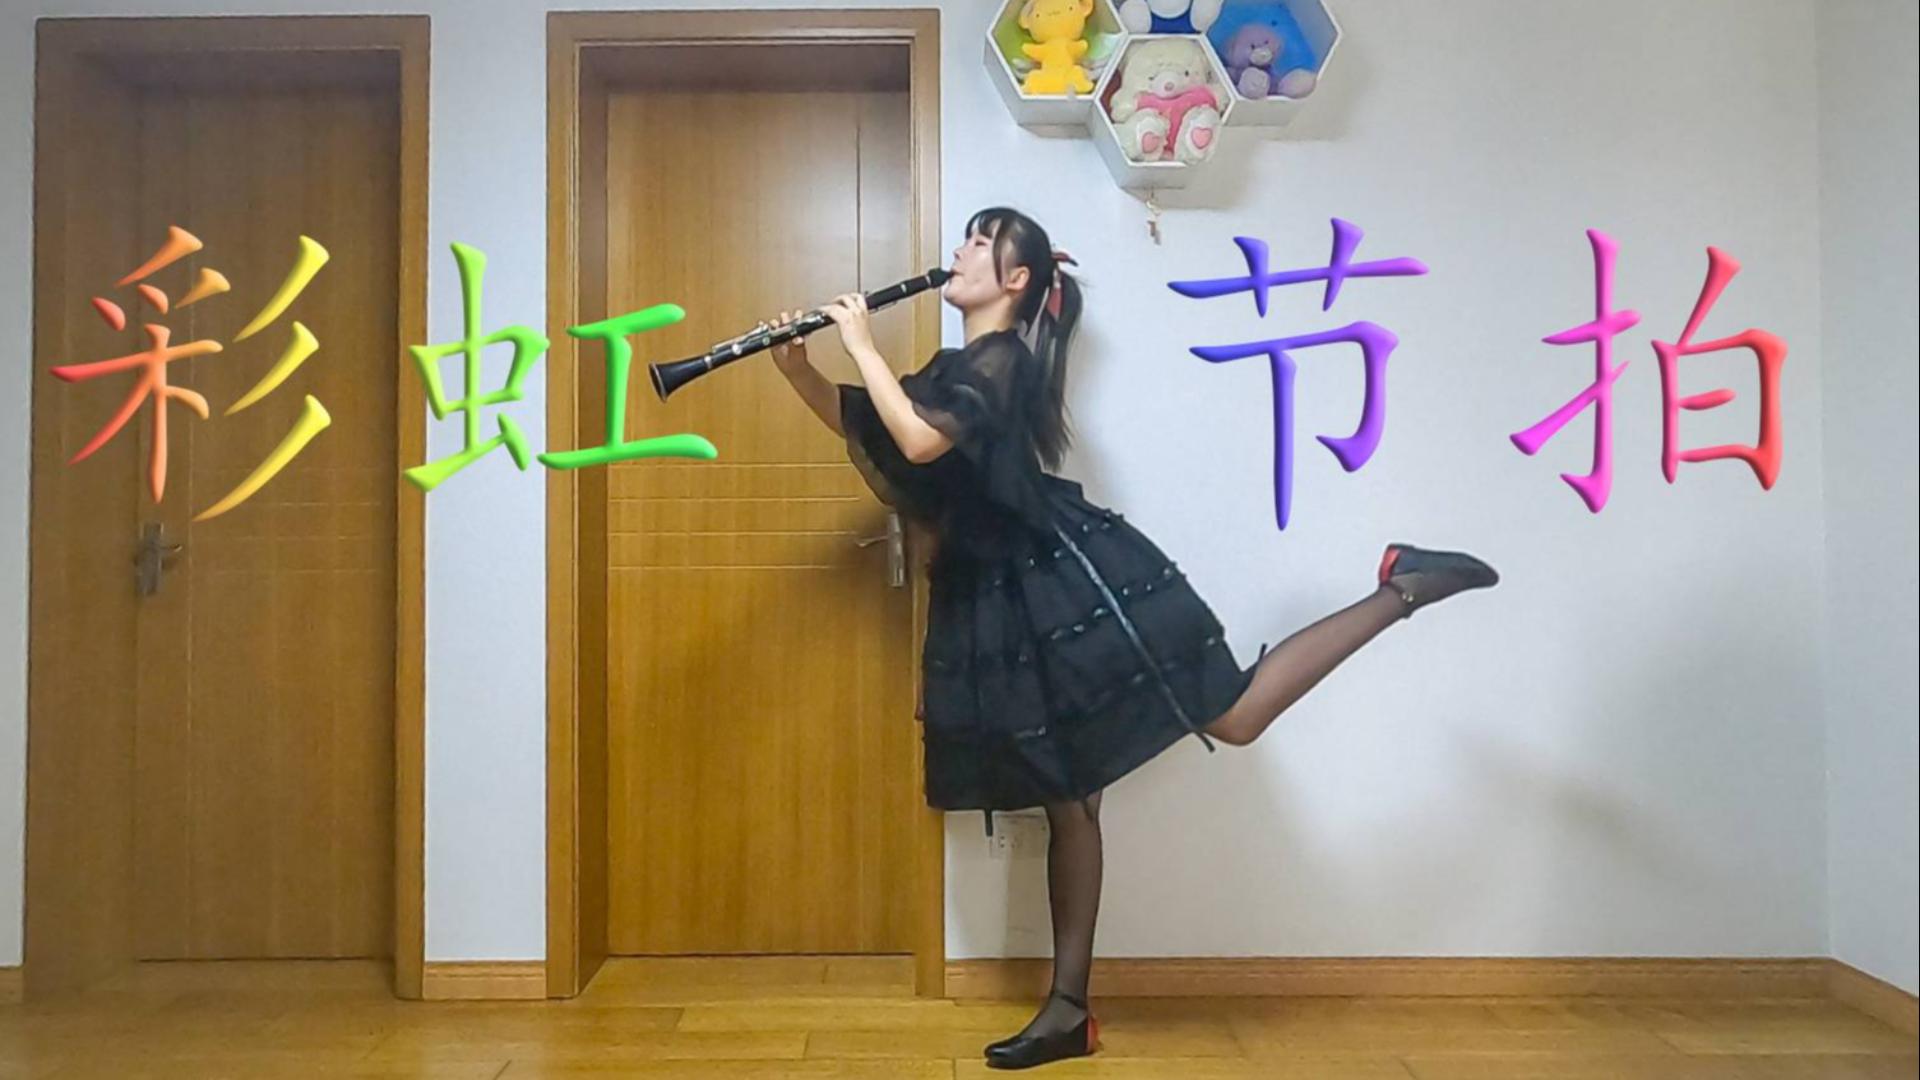 【Honey】彩虹节拍!黑管x宅舞的完美结合~